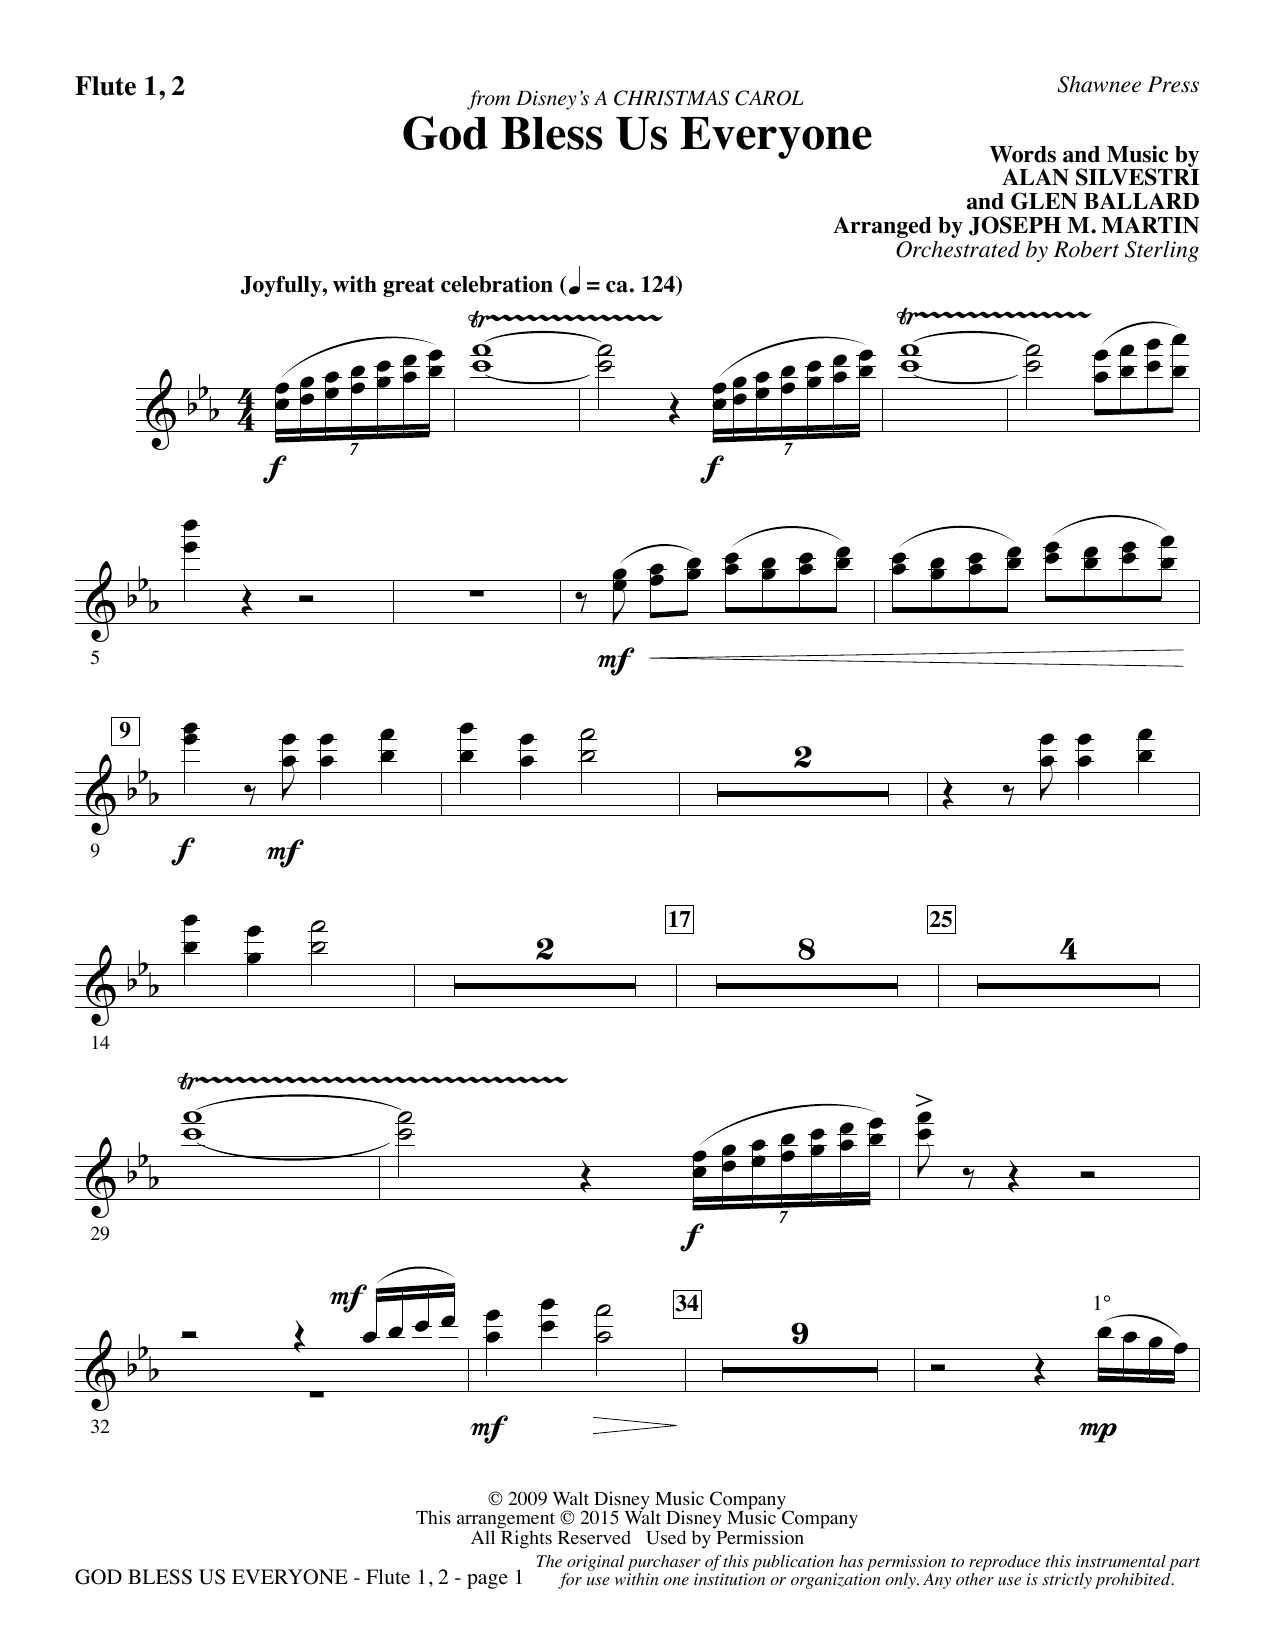 God Bless Us Everyone (from Disney's A Christmas Carol) - Flute 1 & 2 sheet music